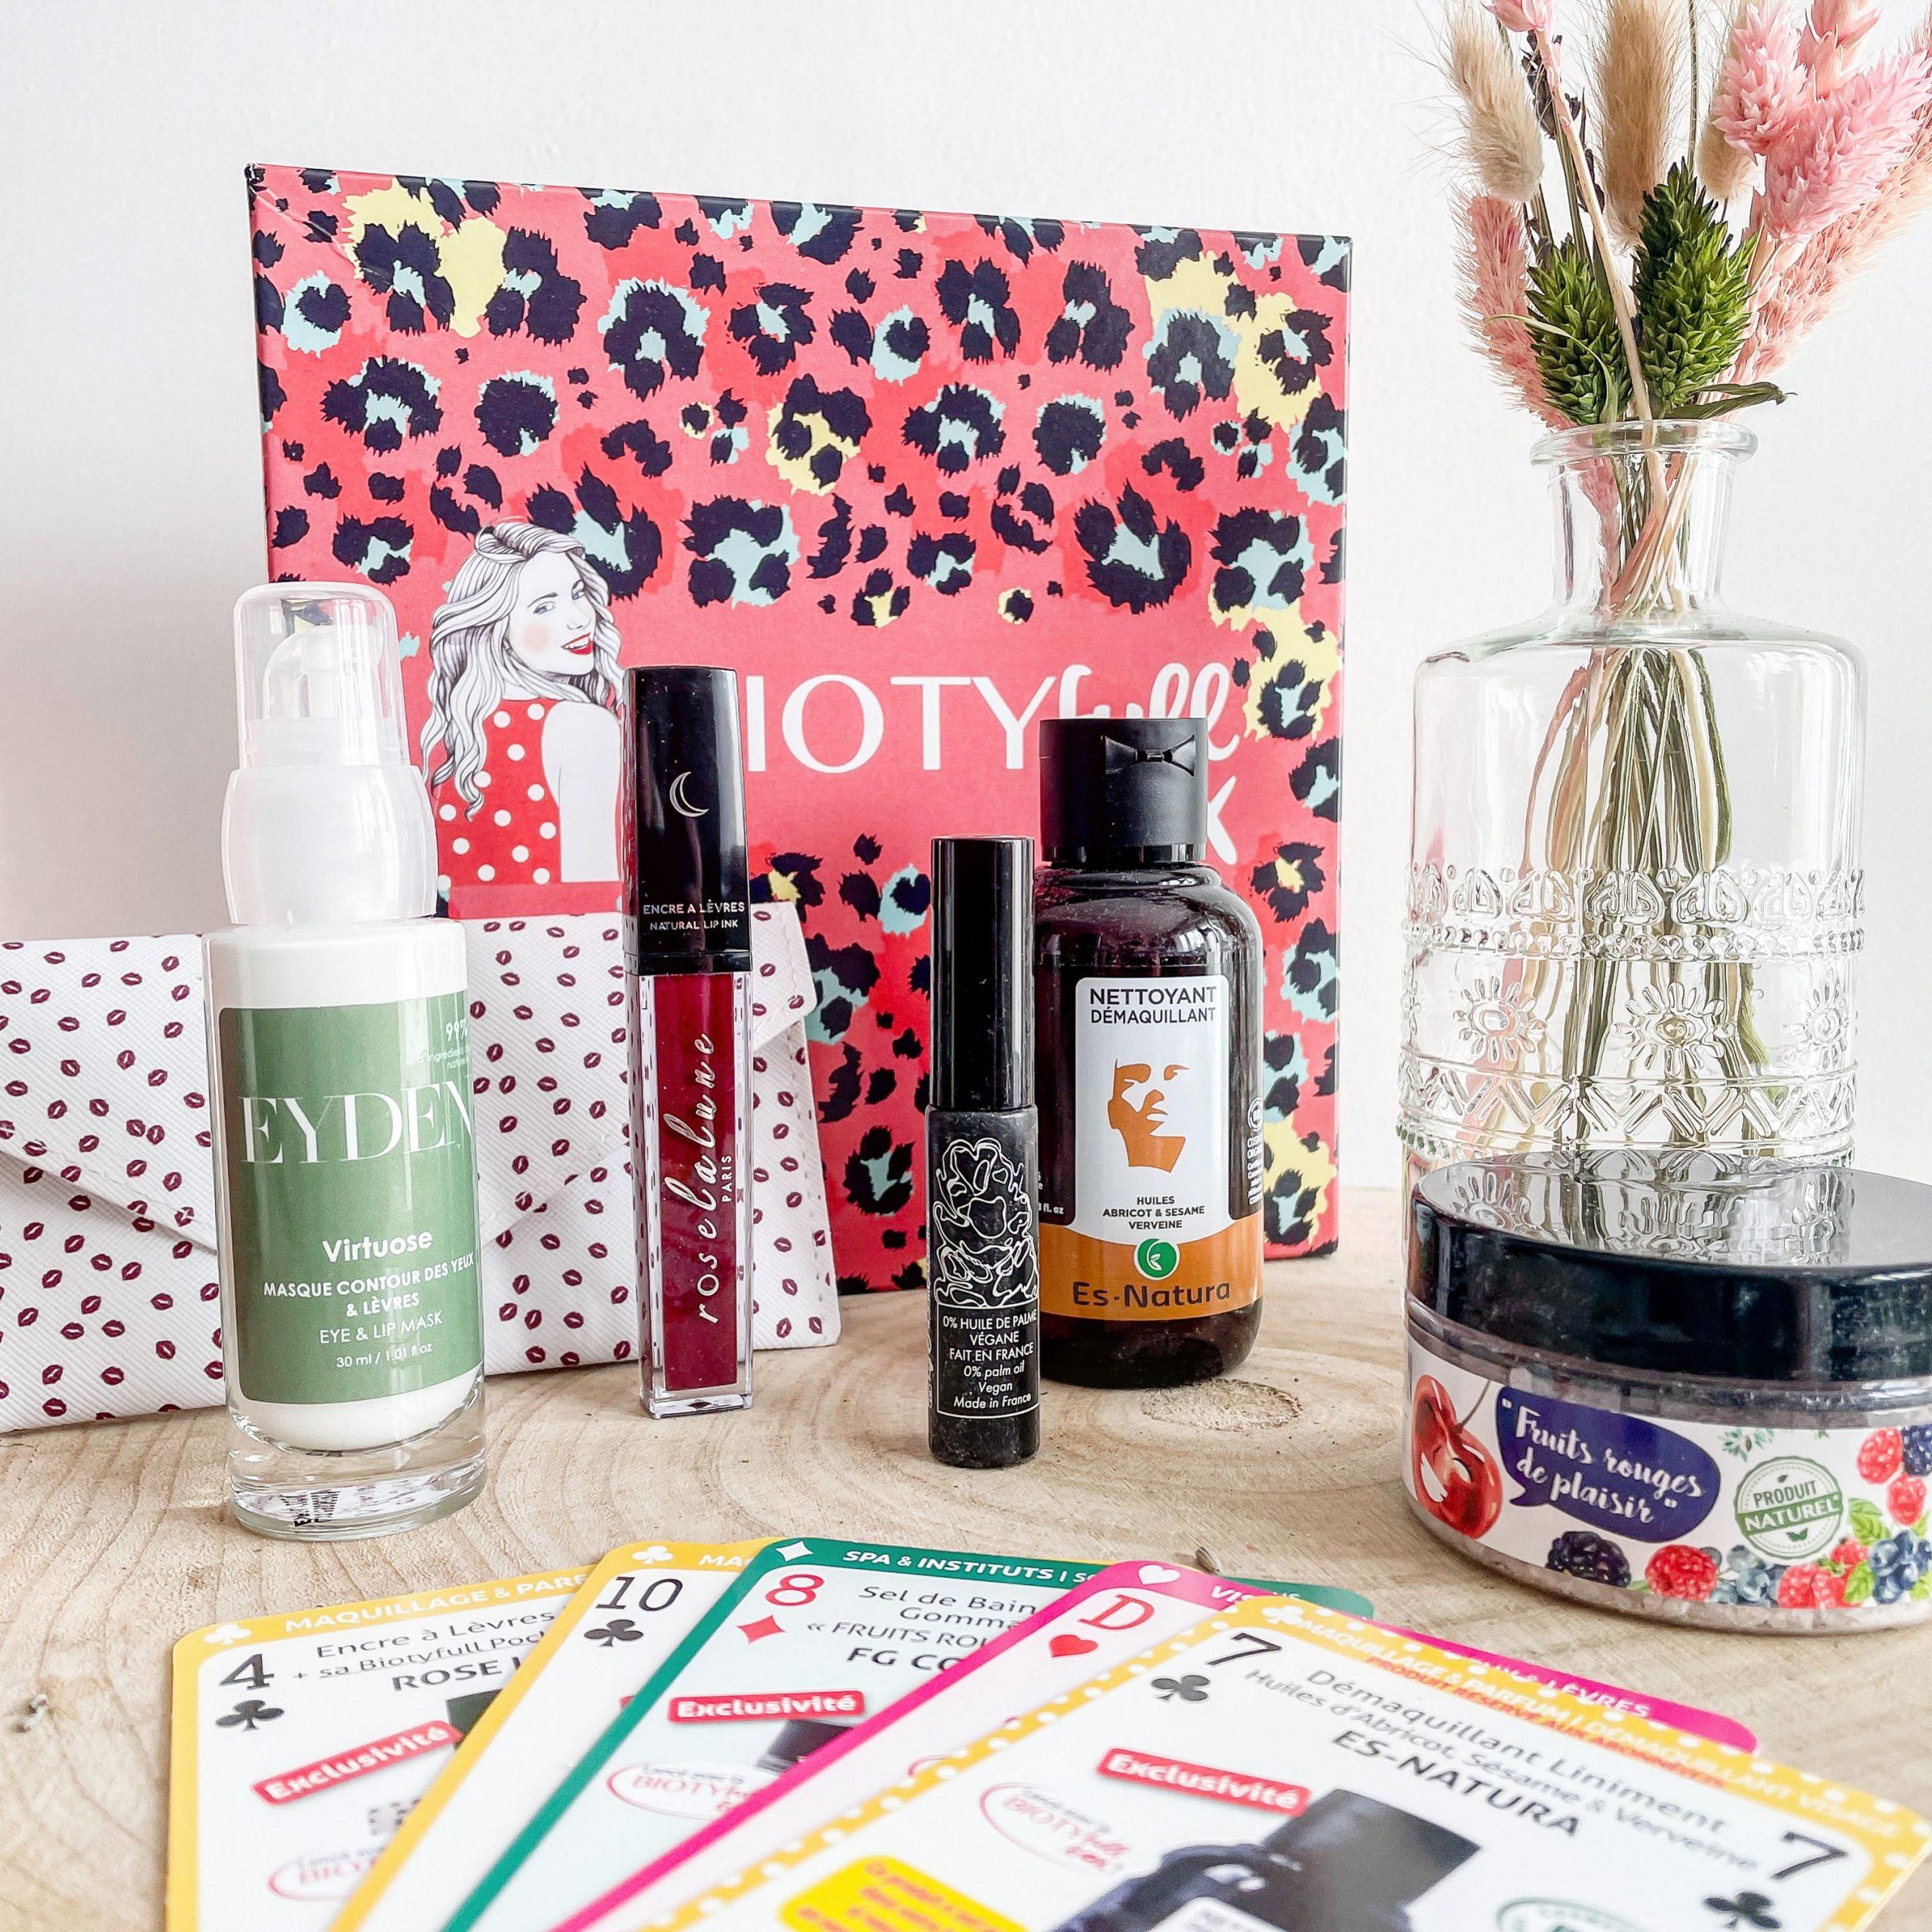 biotyfullbox fevrier 21 glamour saint valentin morandmors blog lifestyle beaute box